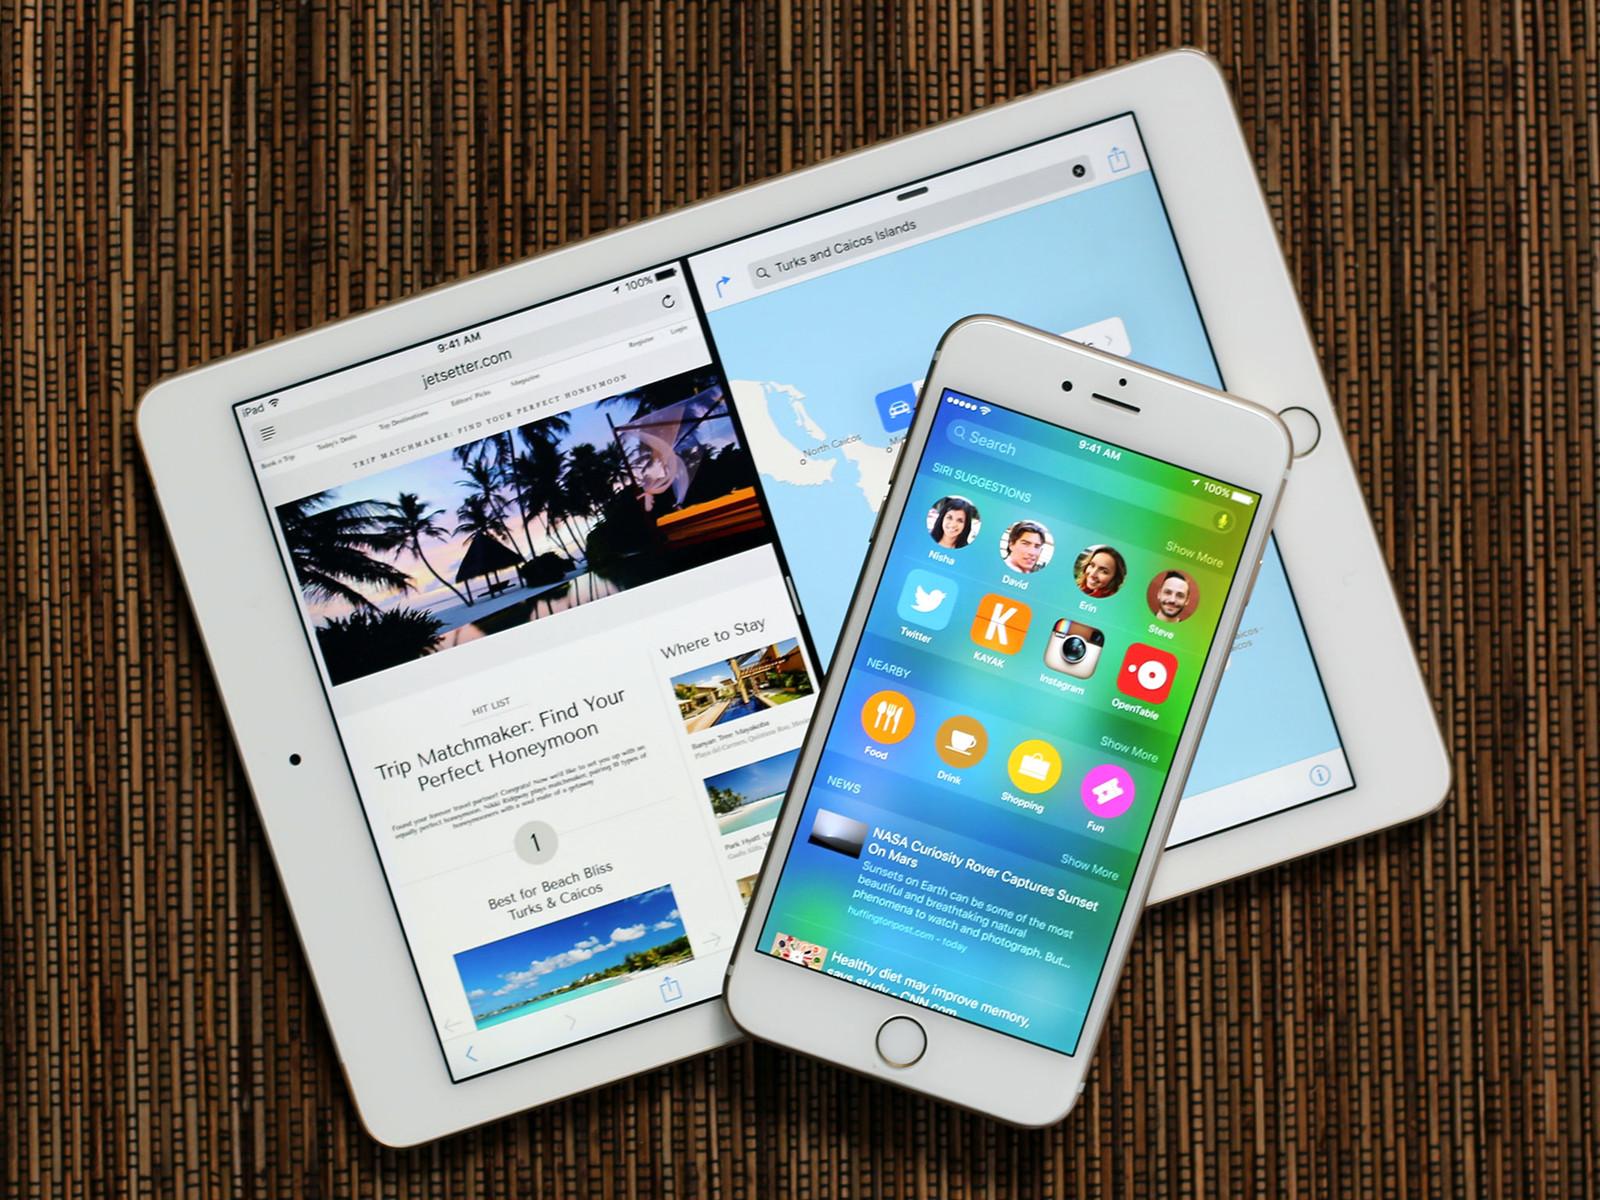 iOS 9 beta GM